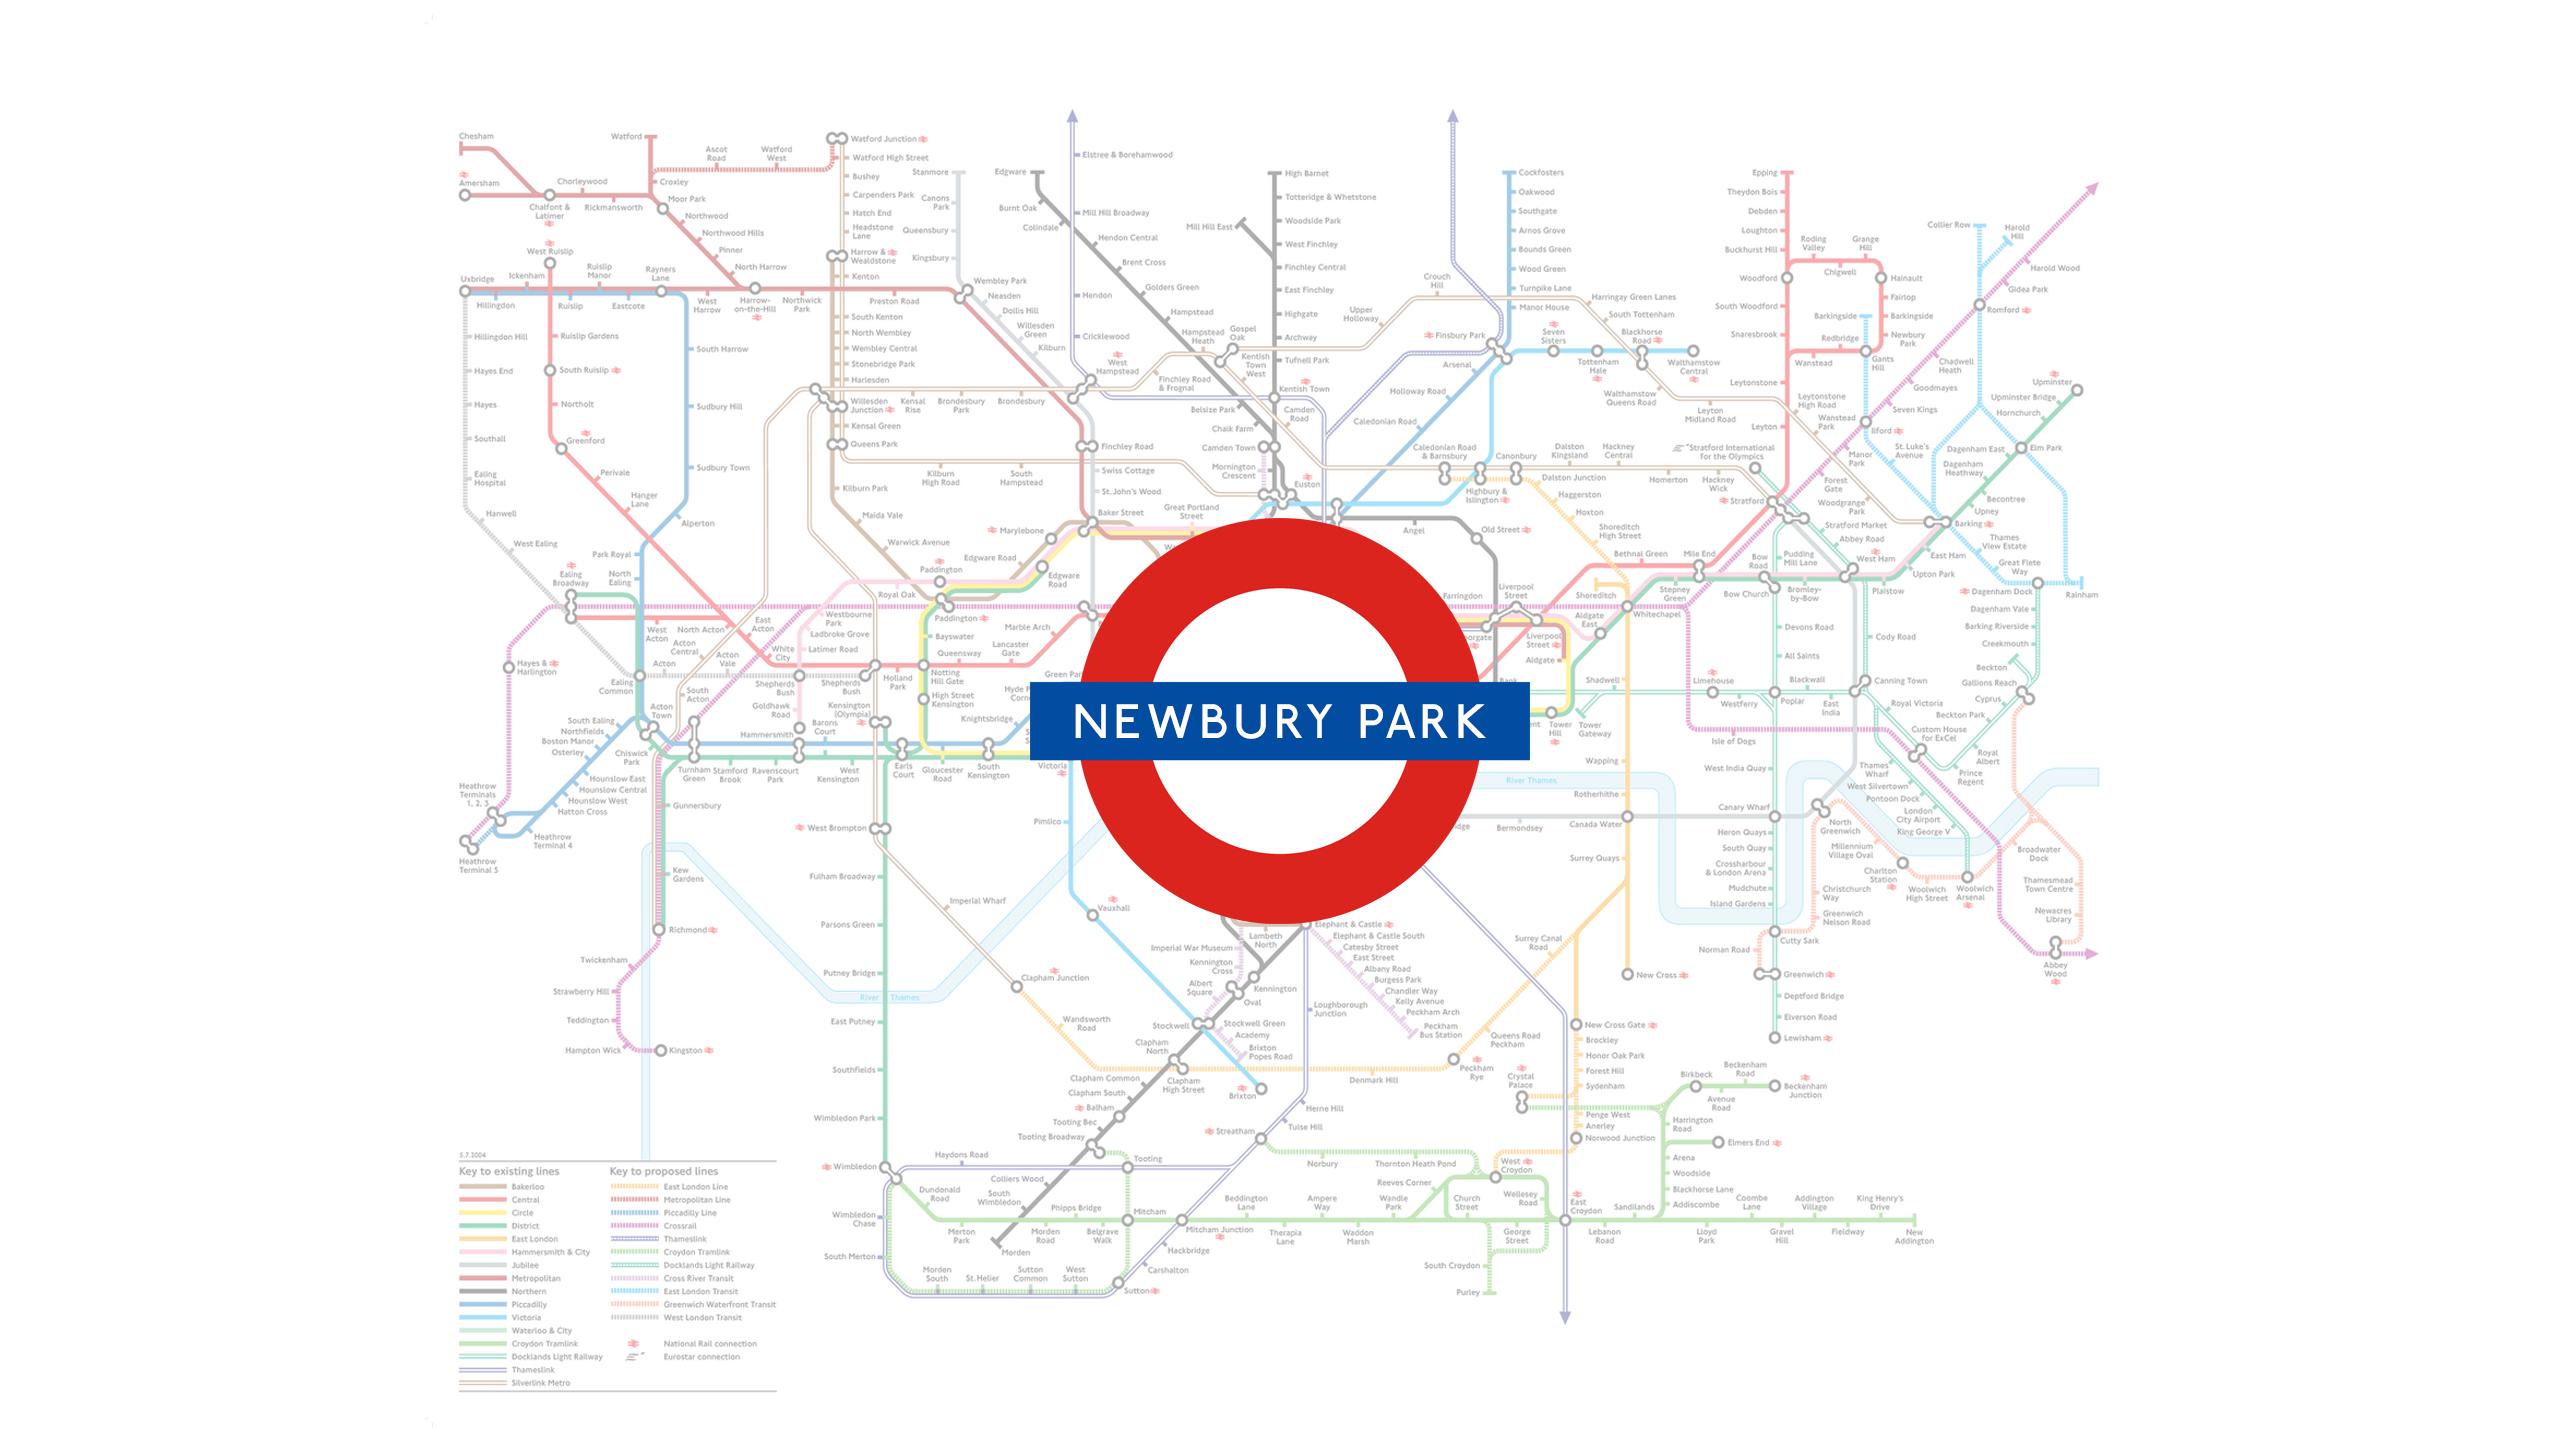 Newbury Park (Map)